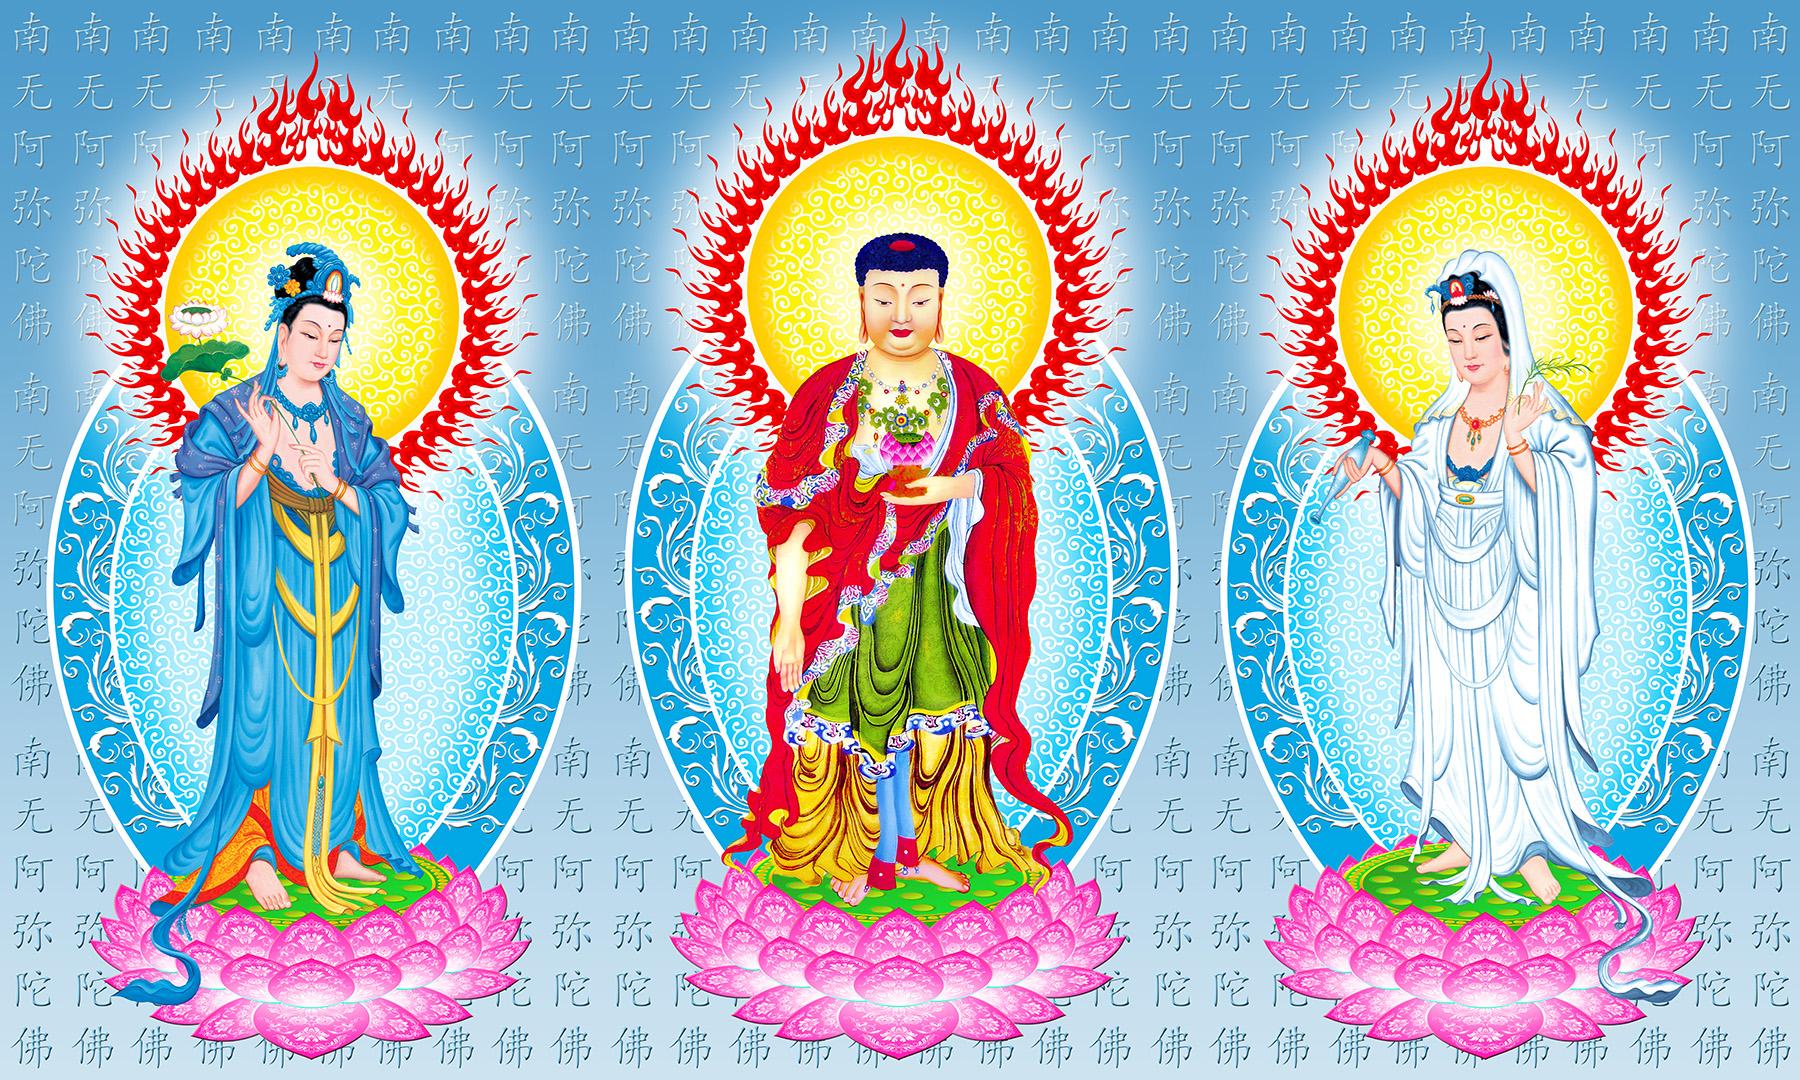 Tay-Phuong-Tam-Thanh-06